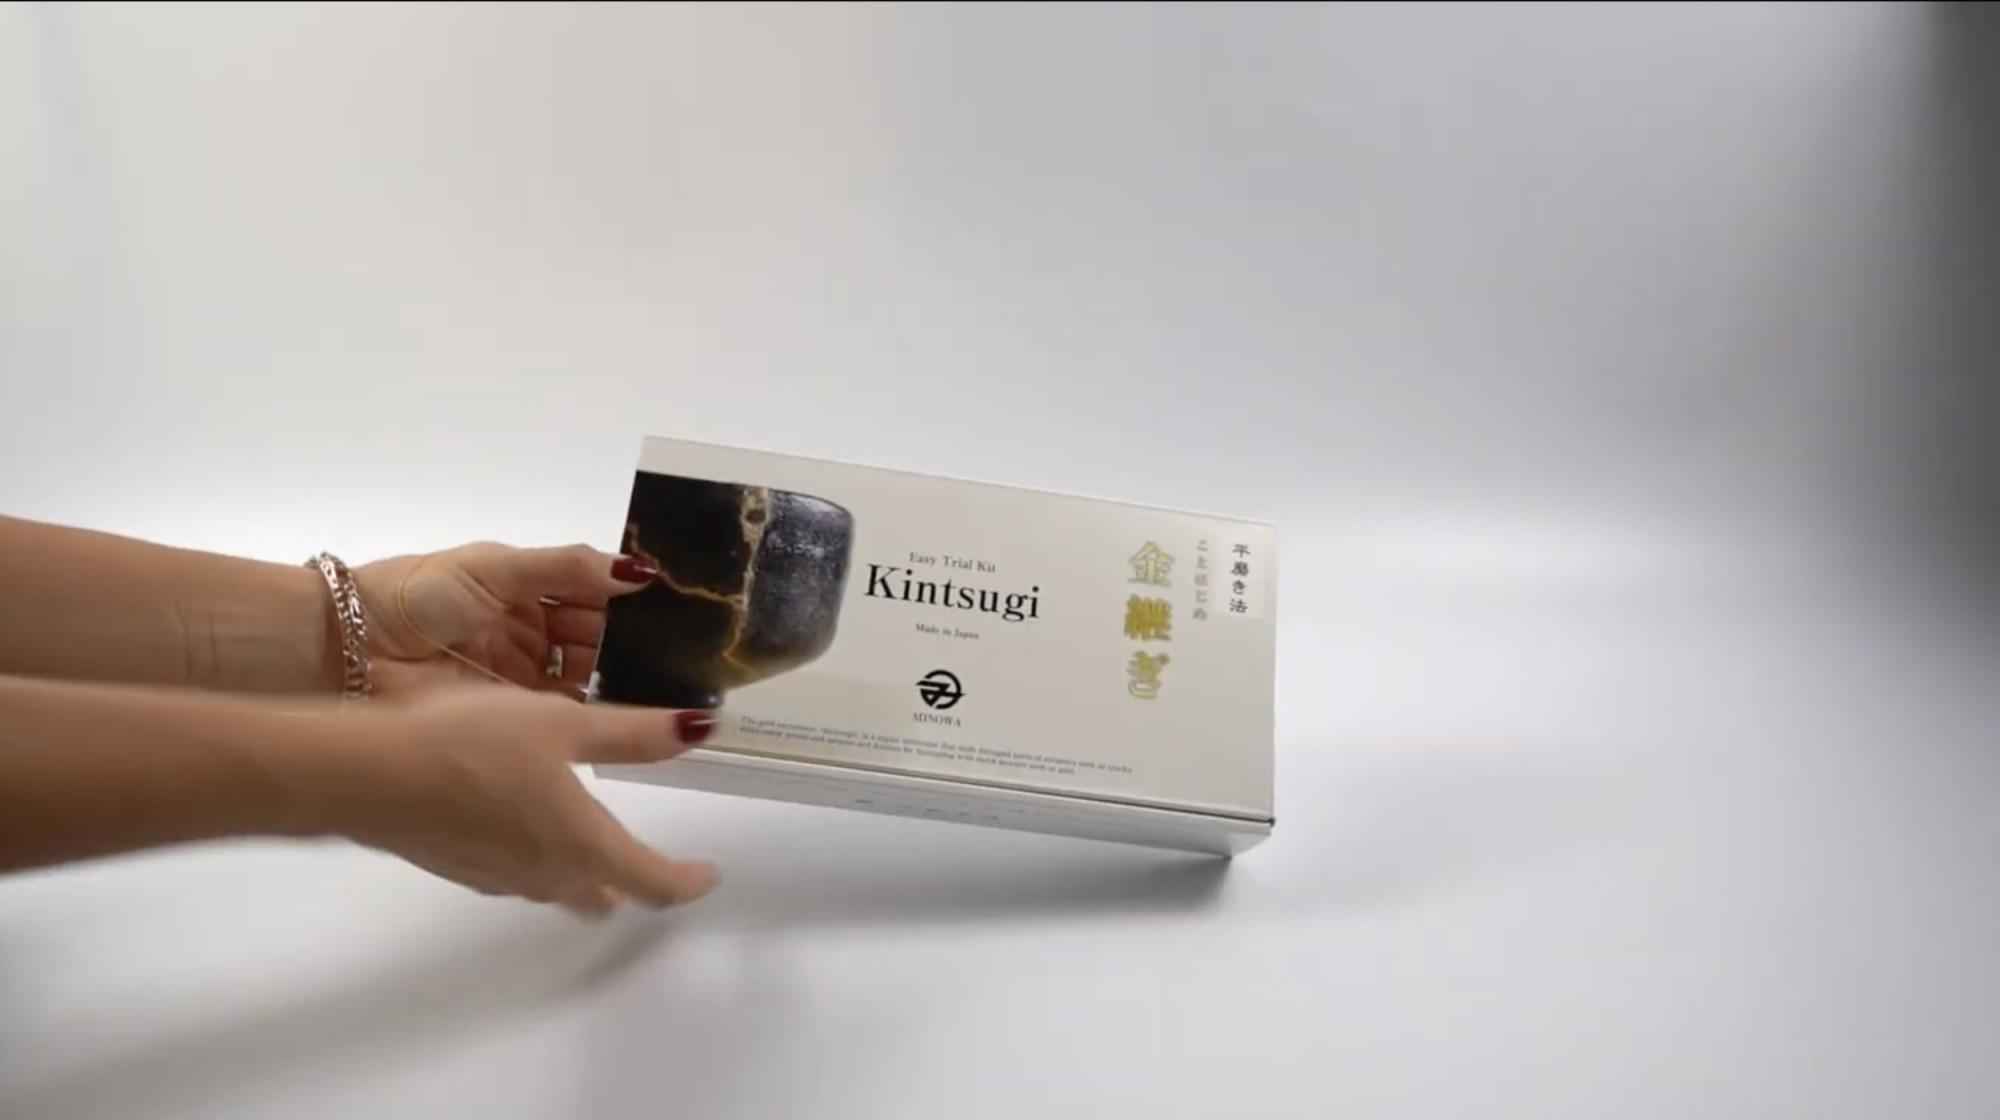 Kintsugi DIY Reparatur-Kit- Produkt-Video unboxing